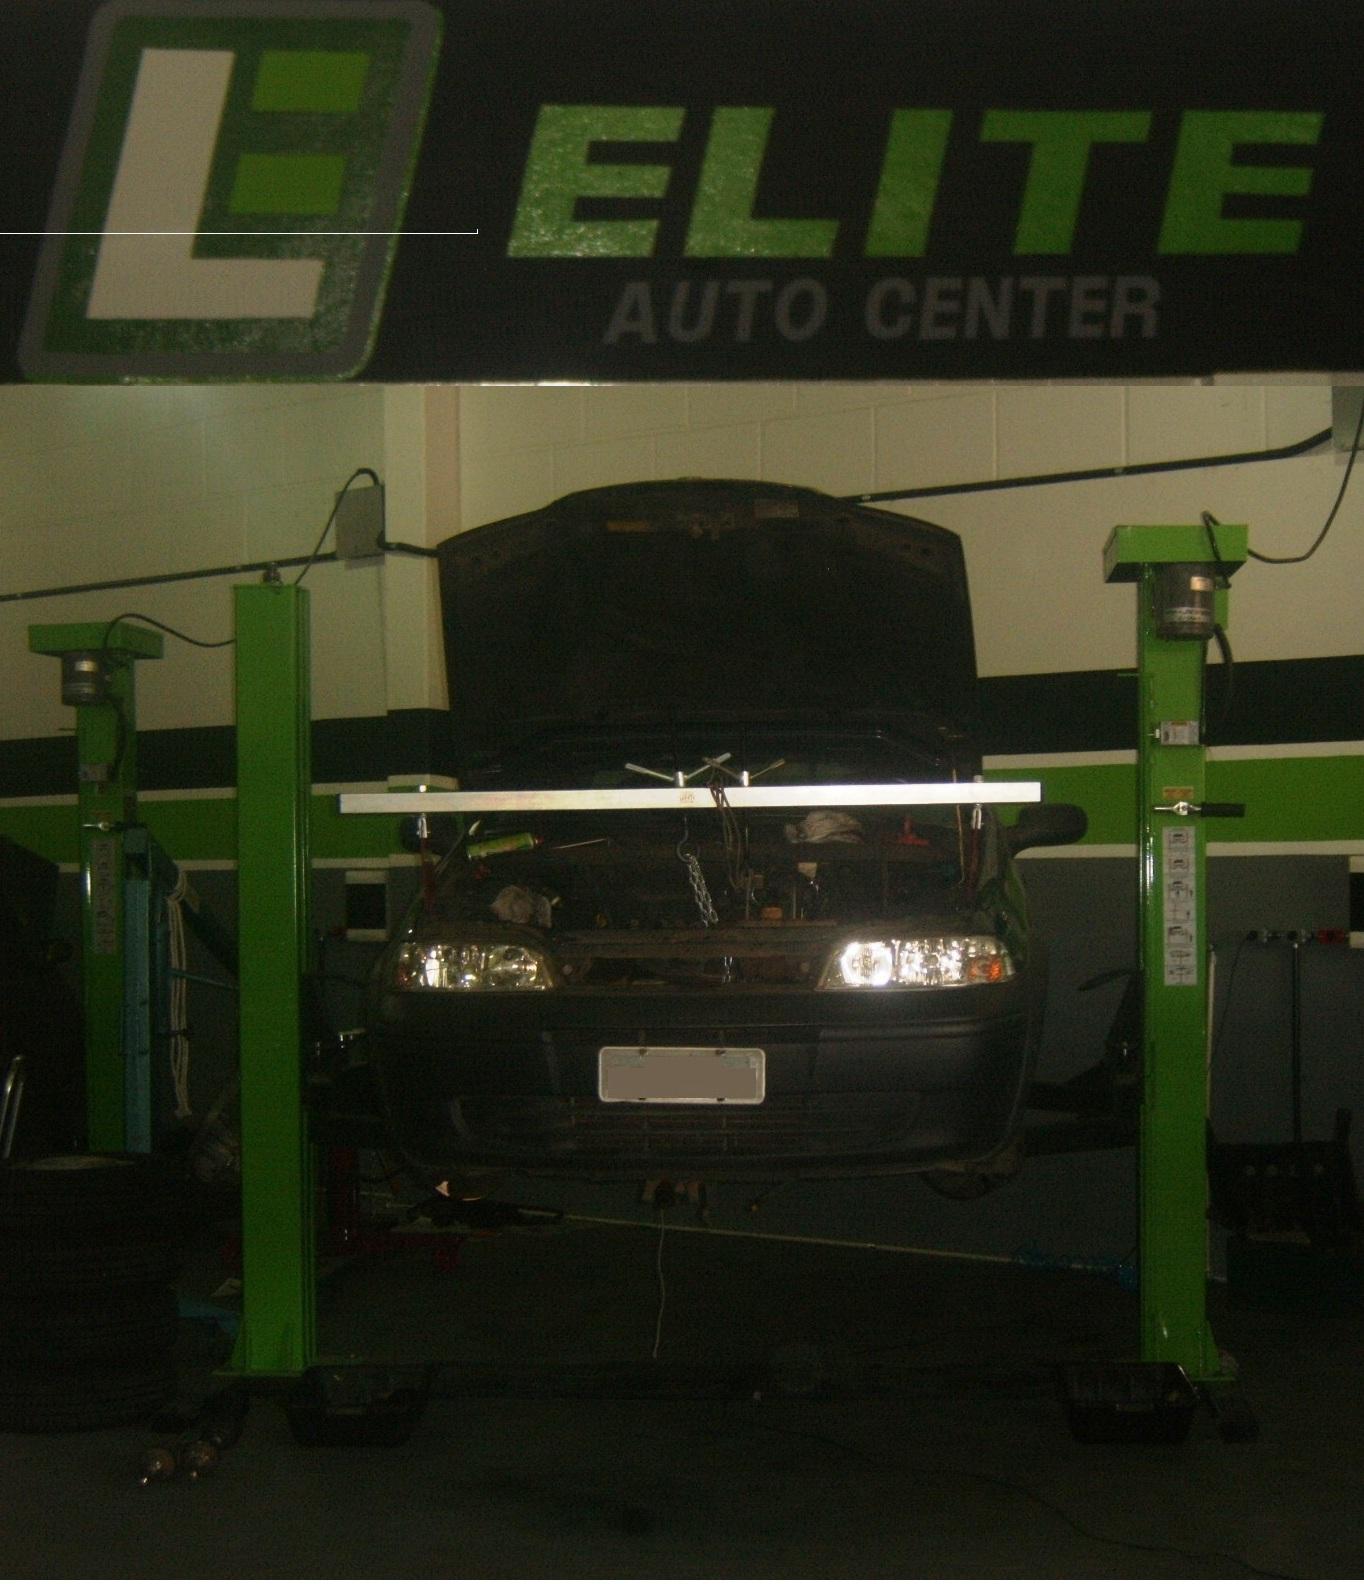 elite auto center. Black Bedroom Furniture Sets. Home Design Ideas